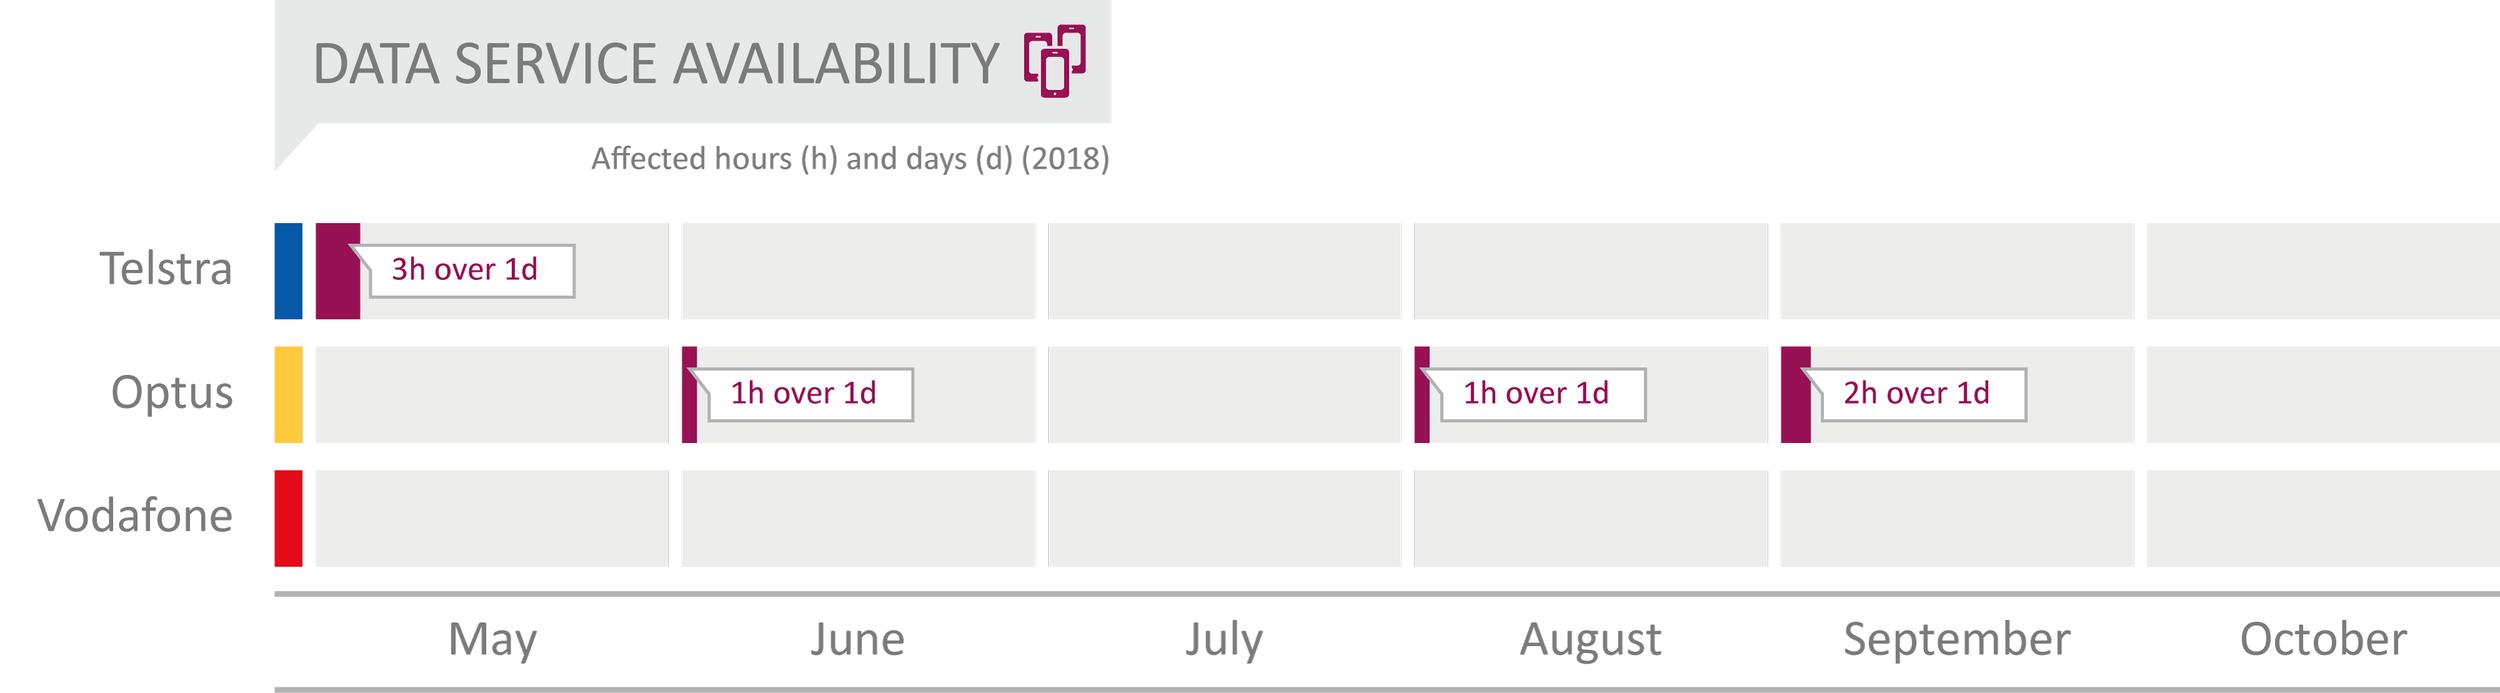 AUS_2018_Data_Service_Availability_neu.png